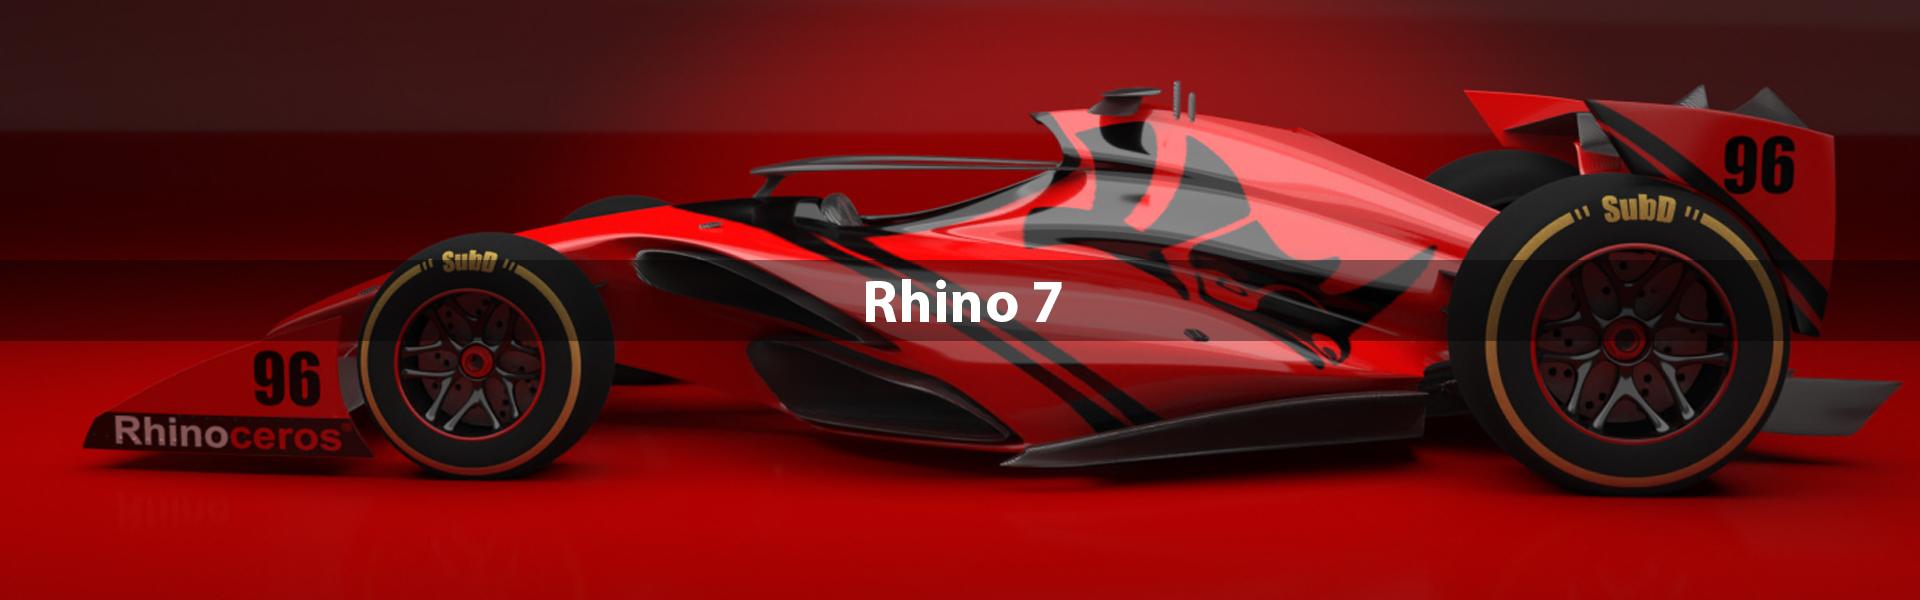 Rhino 7 Ferrari